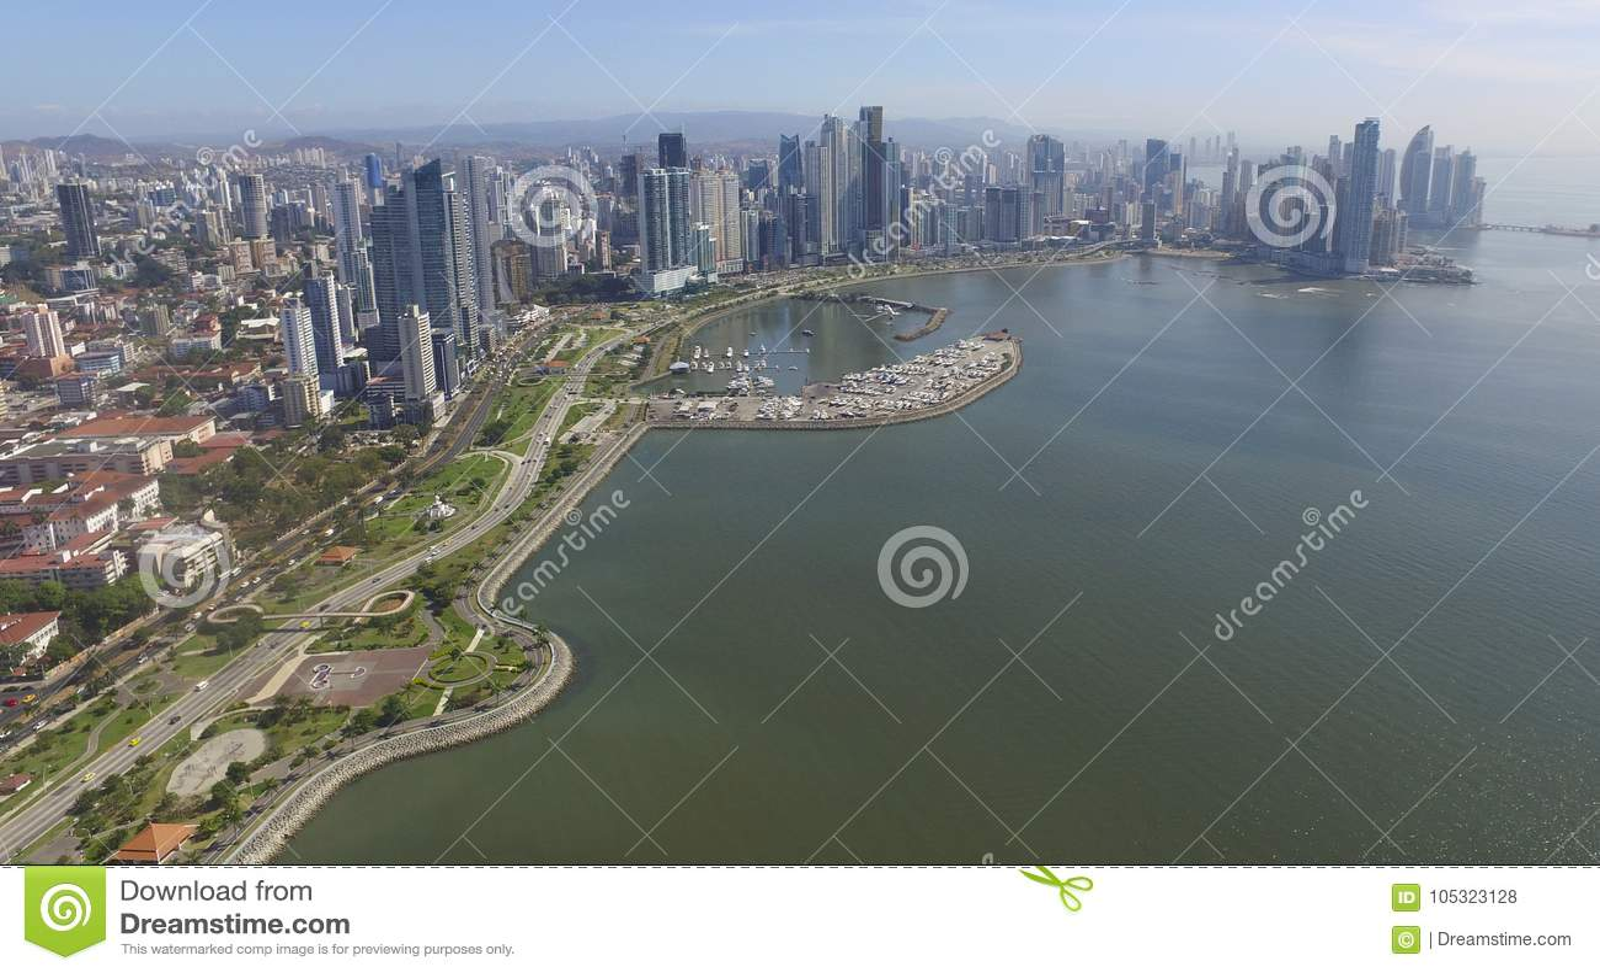 panama Coastal strip